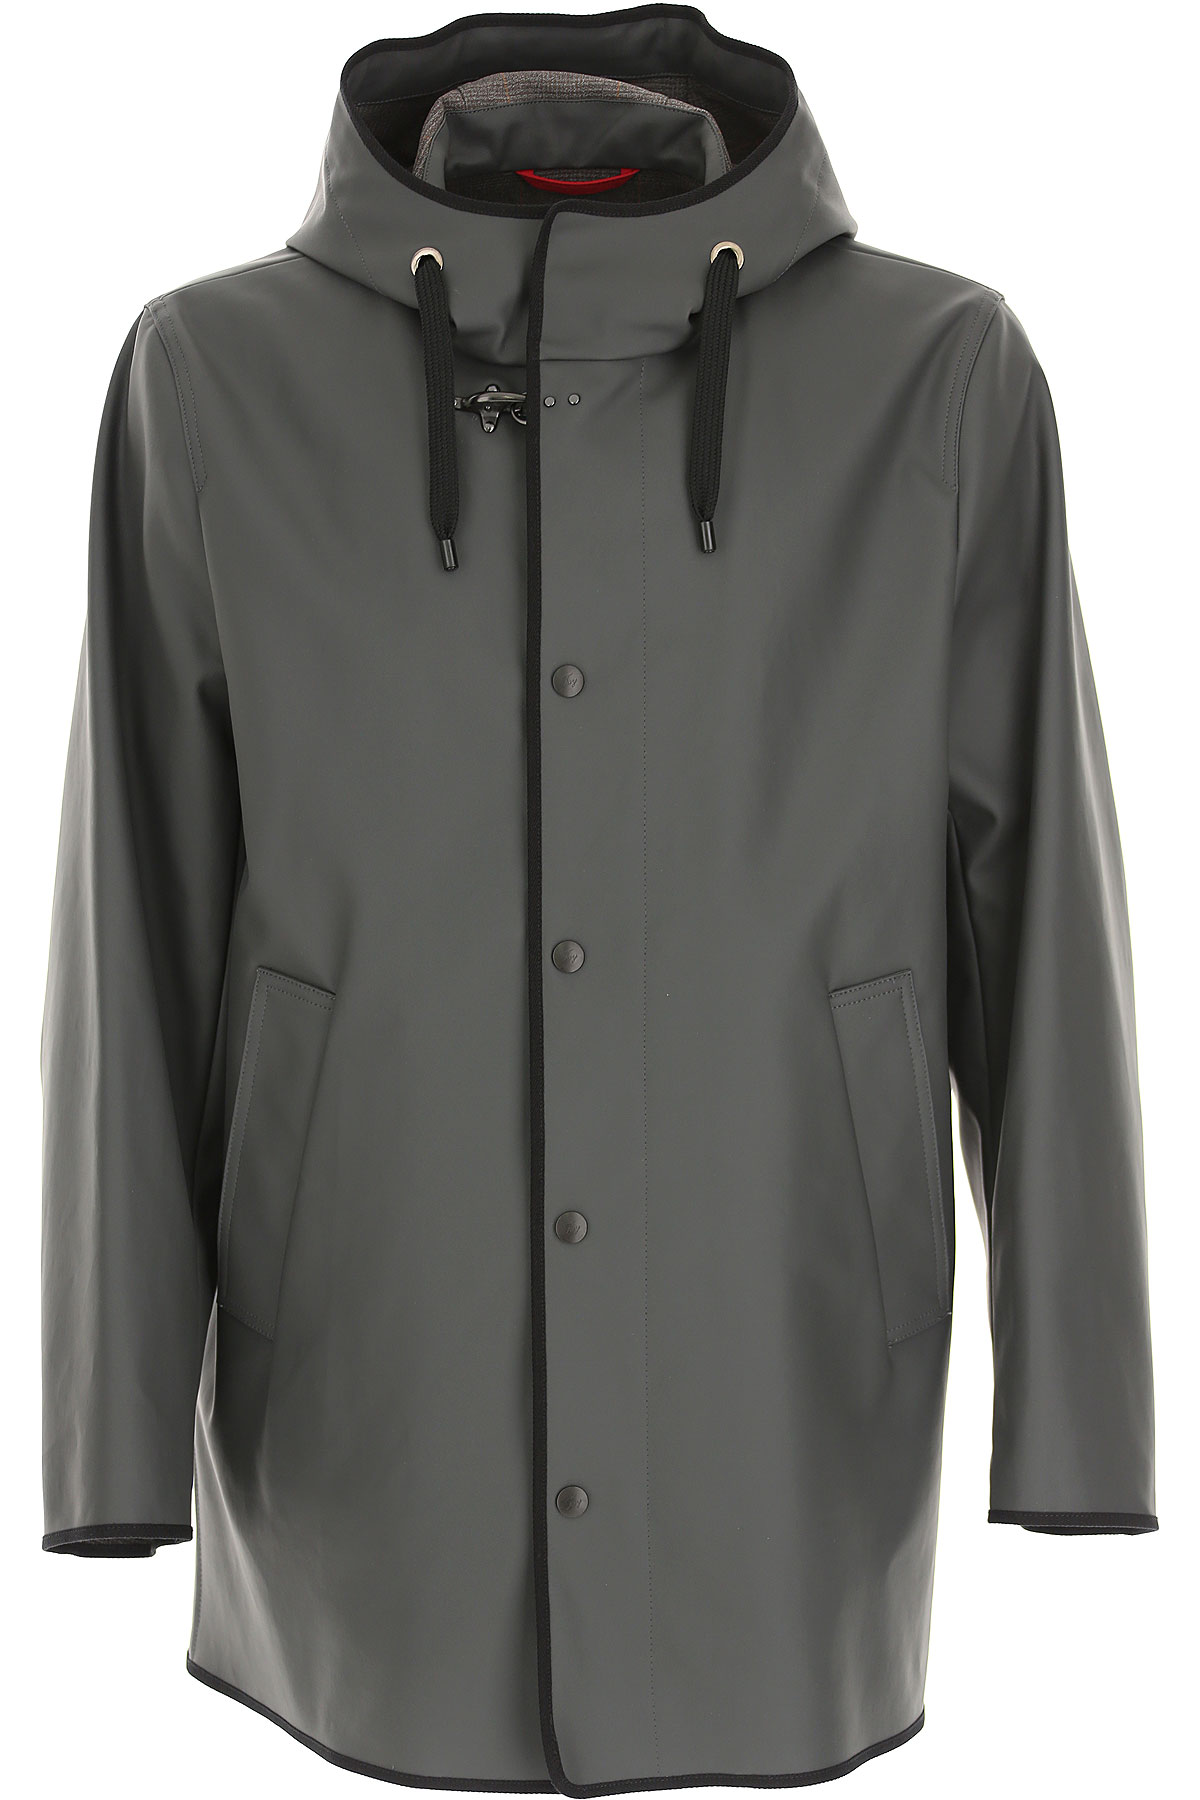 Fay Jacket for Men On Sale, dark stone grey, Cotton, 2019, L M XL